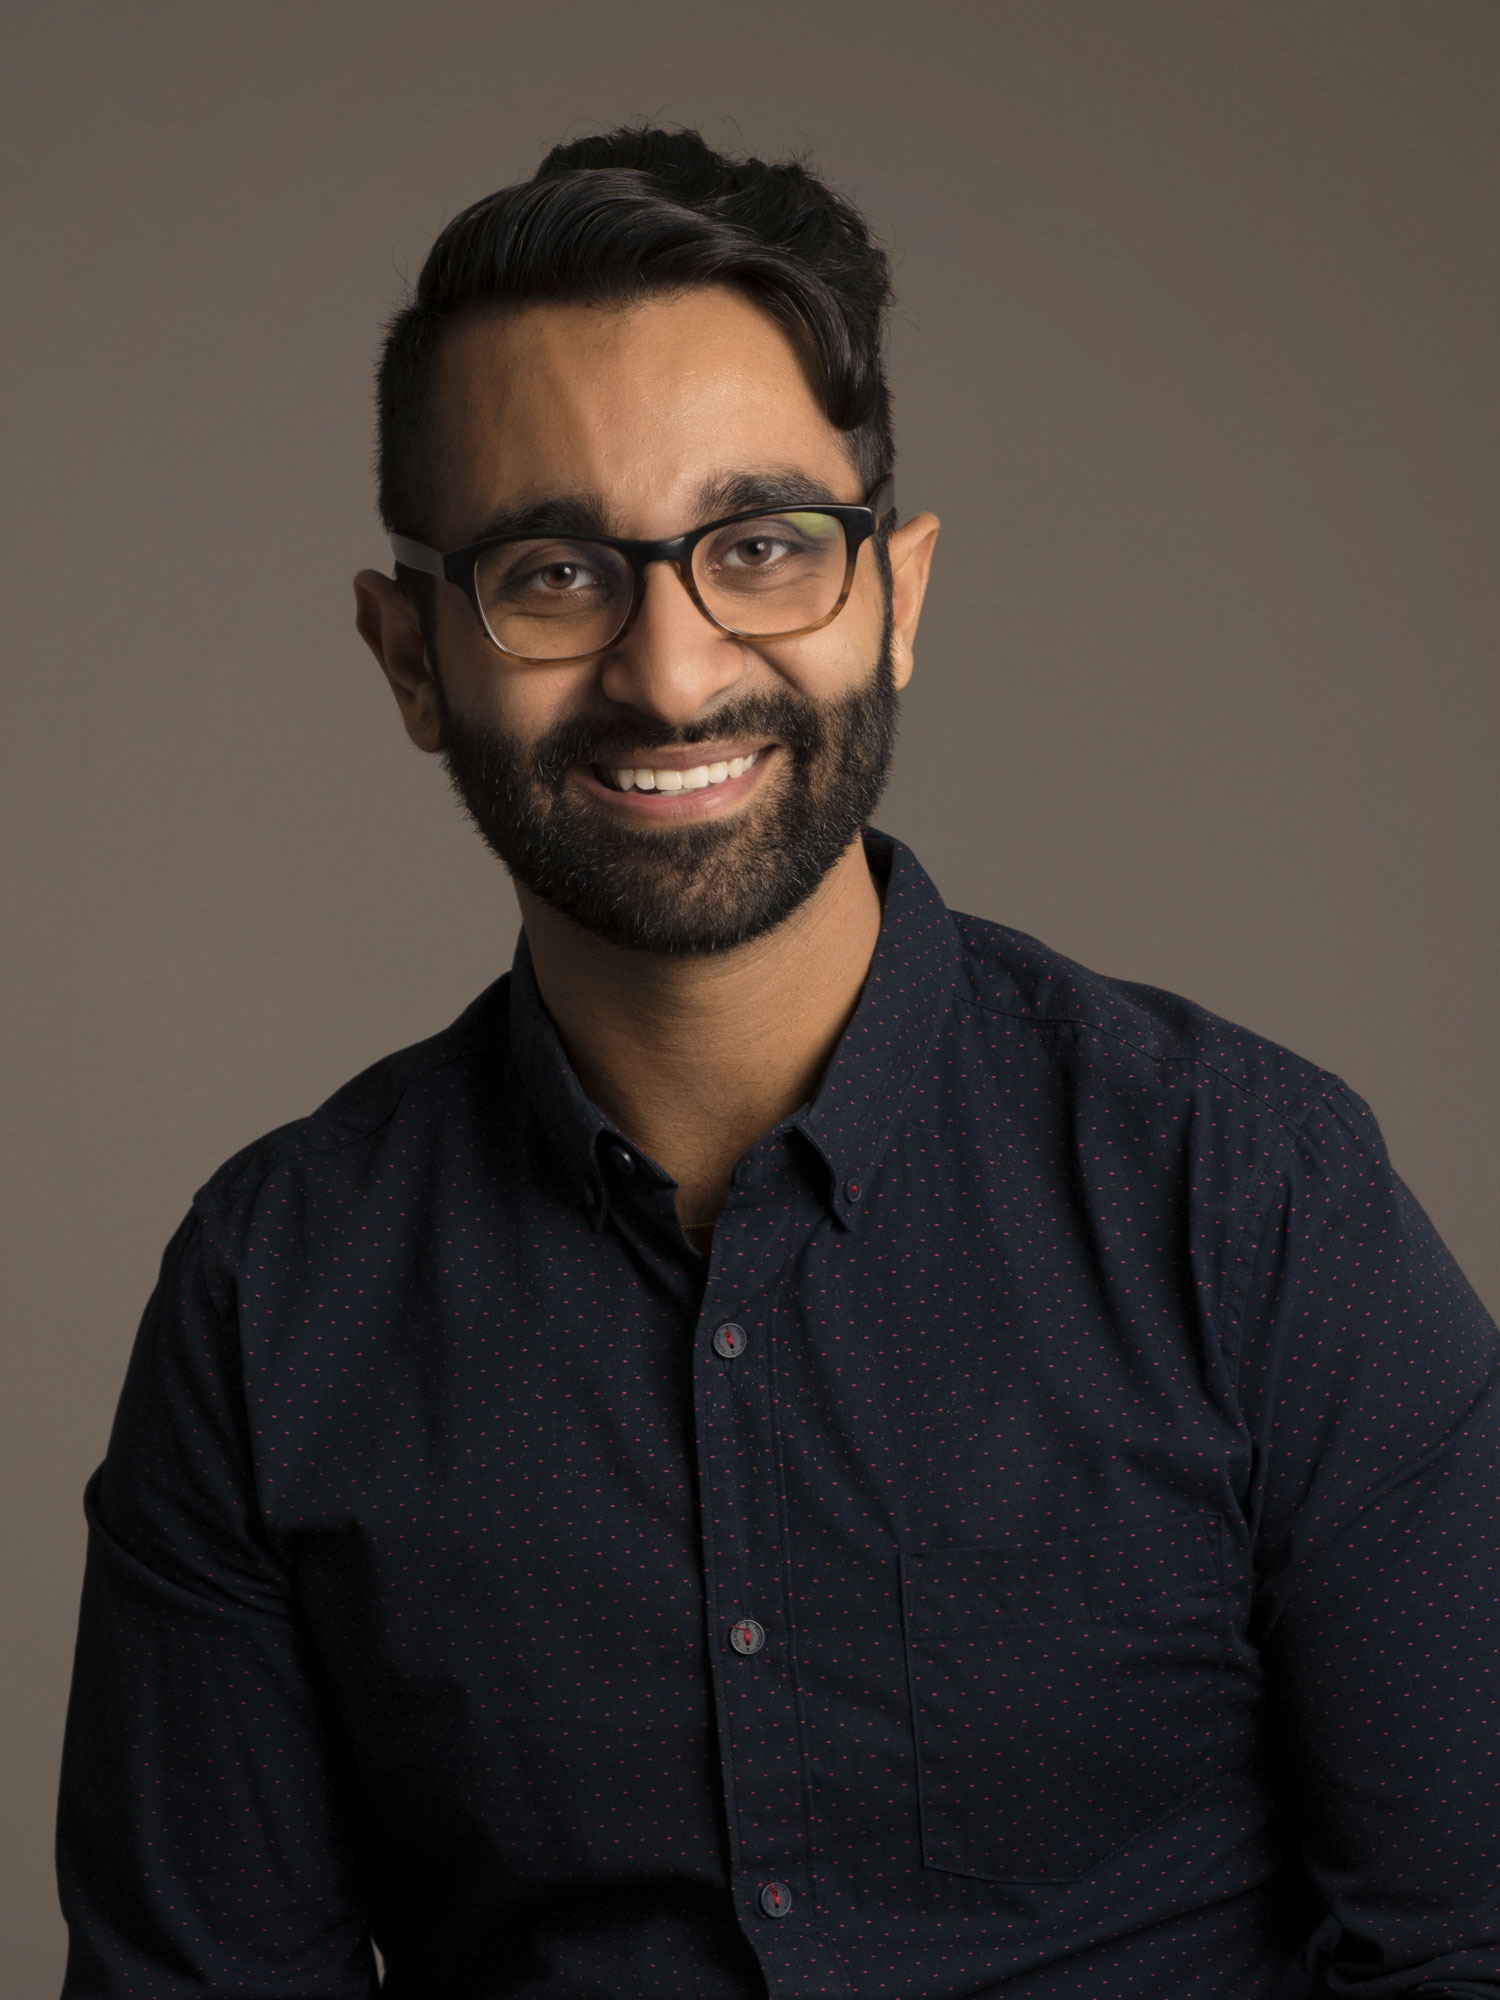 Mohsan Abdullah